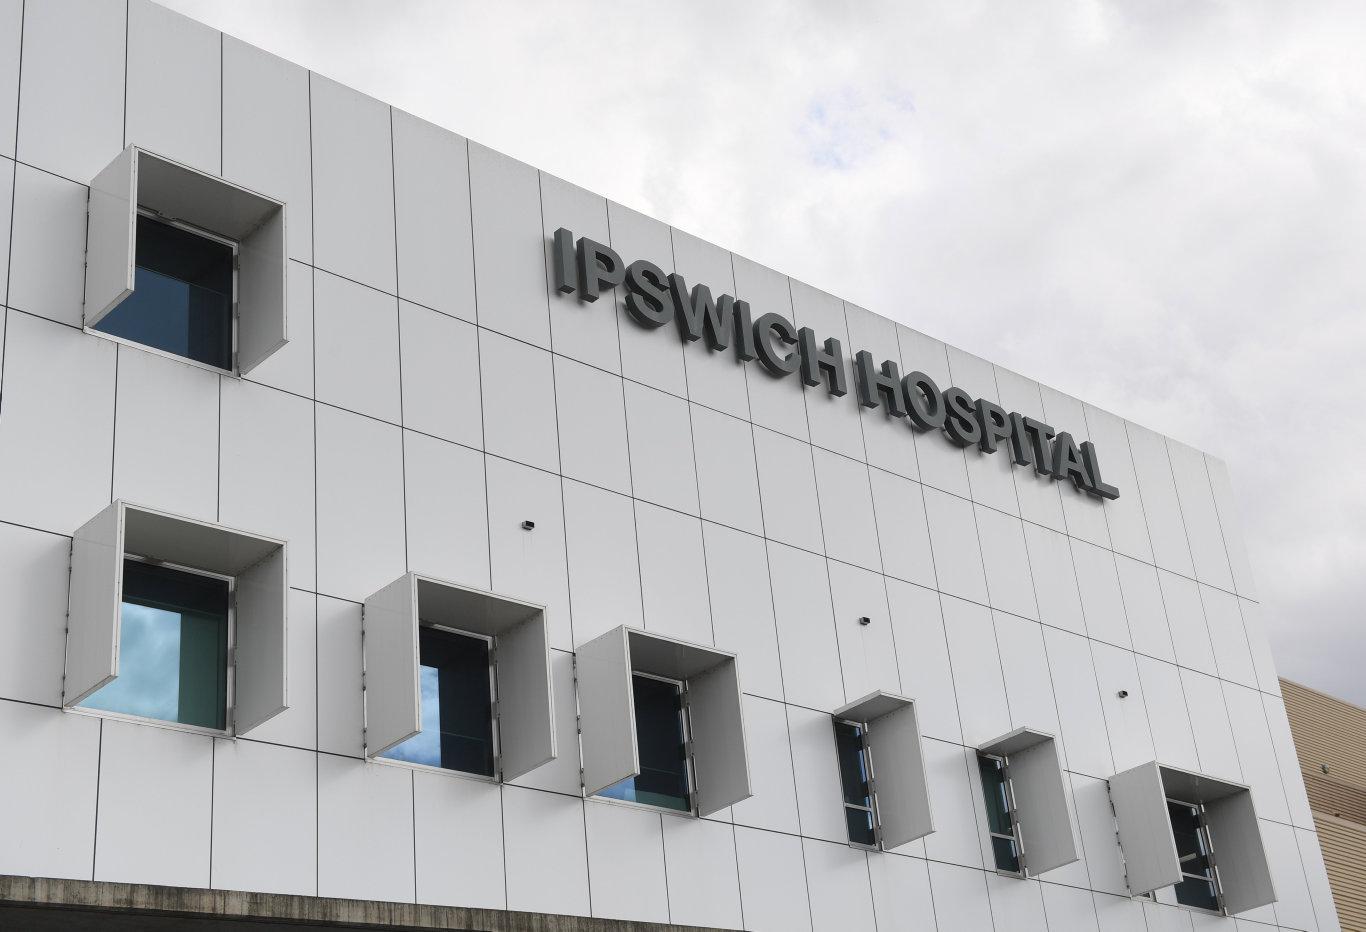 A man was taken to Ipswich Hospital following a crash.